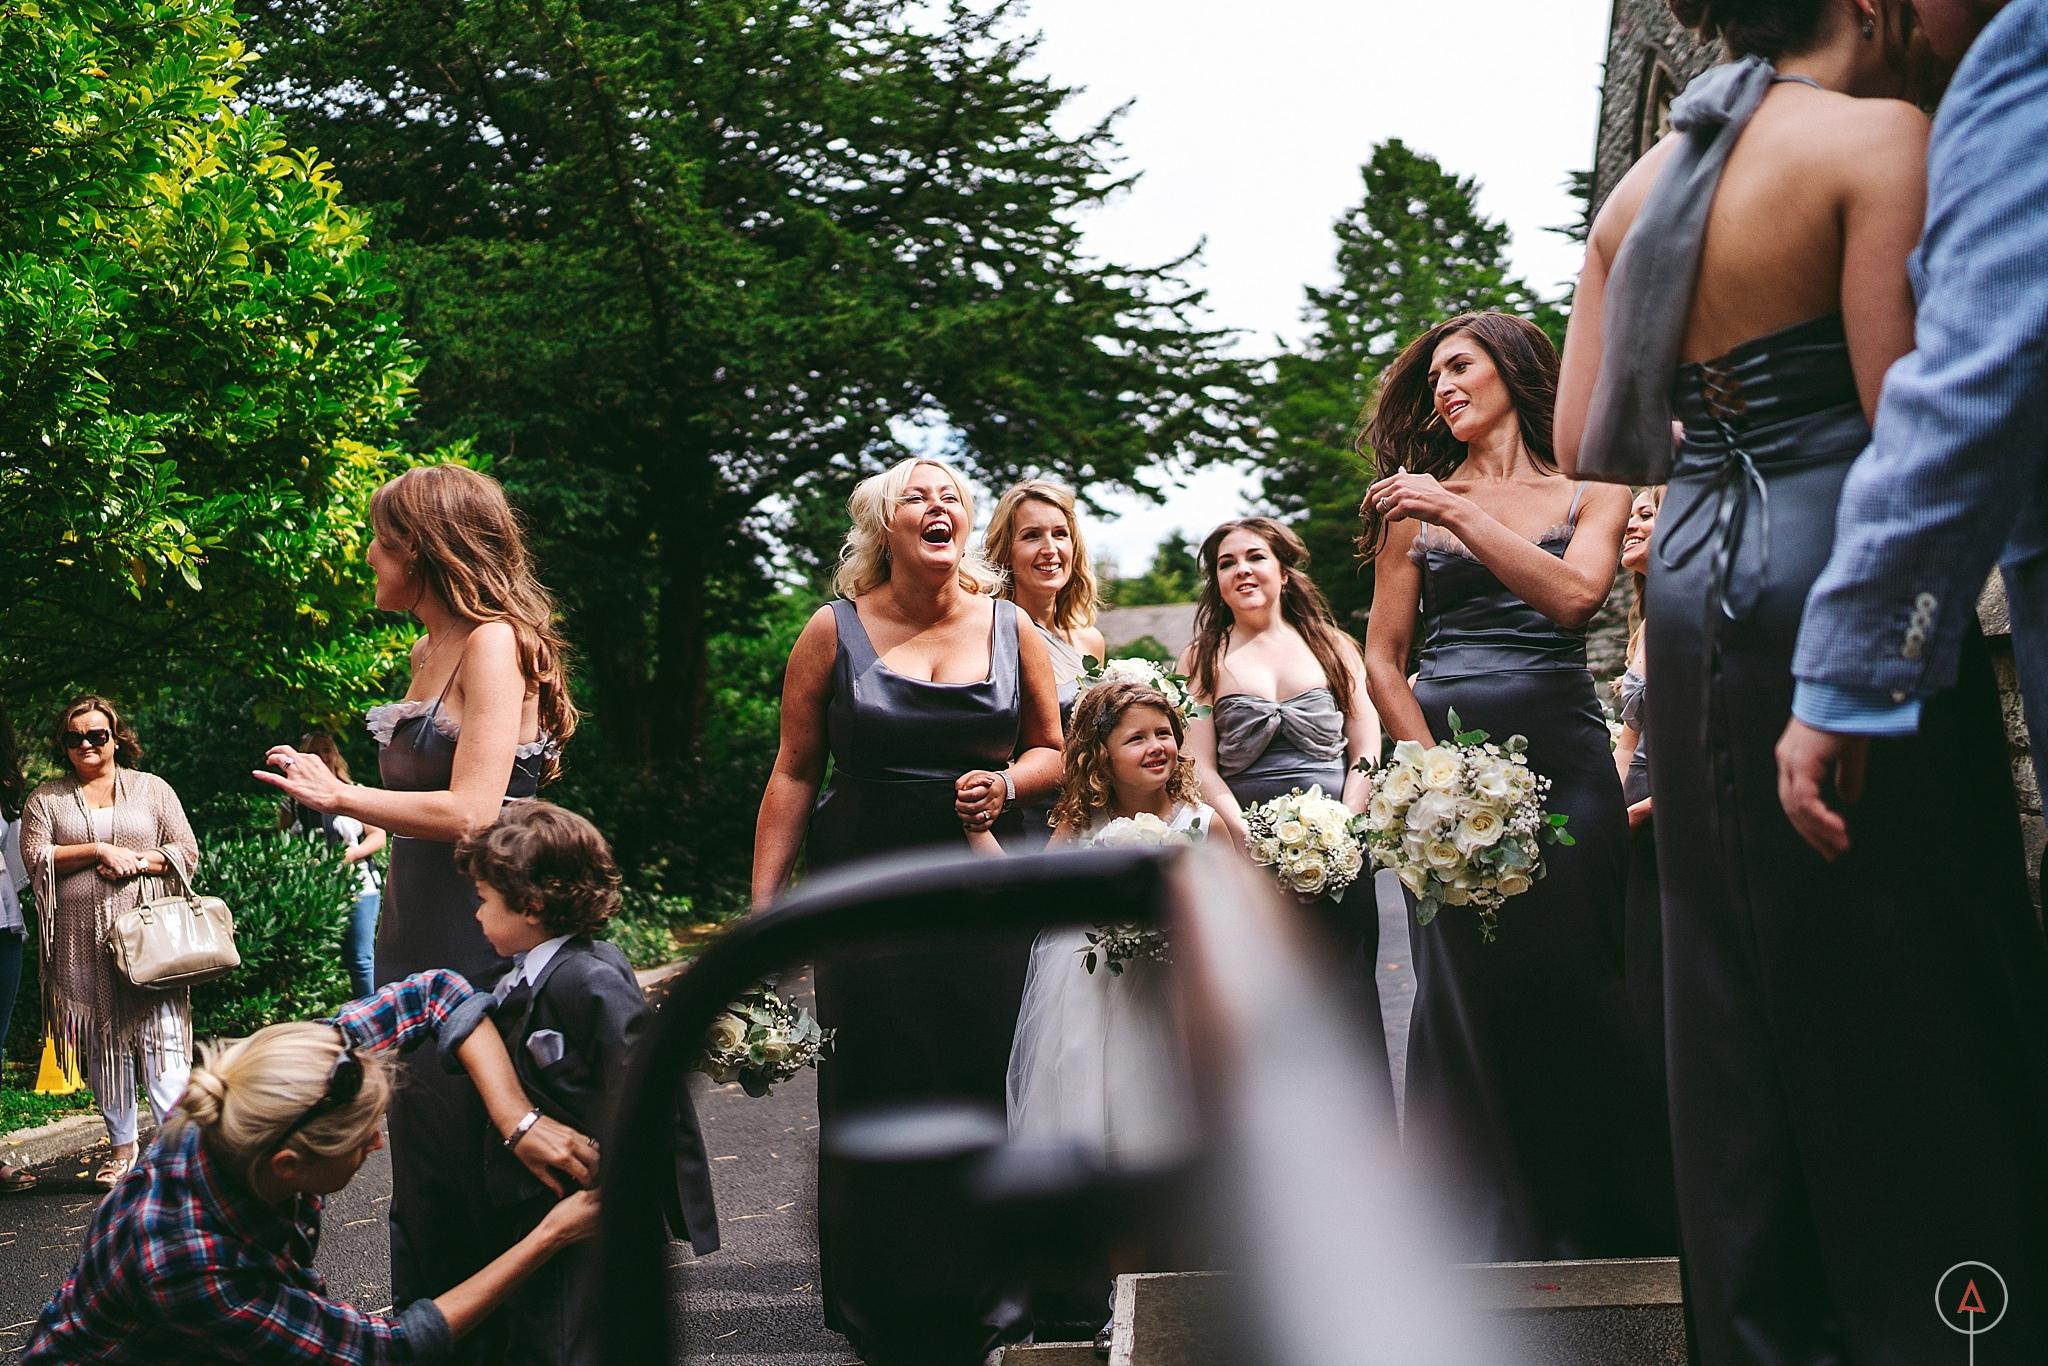 cardiff-wedding-photographer-aga-tomaszek_0360